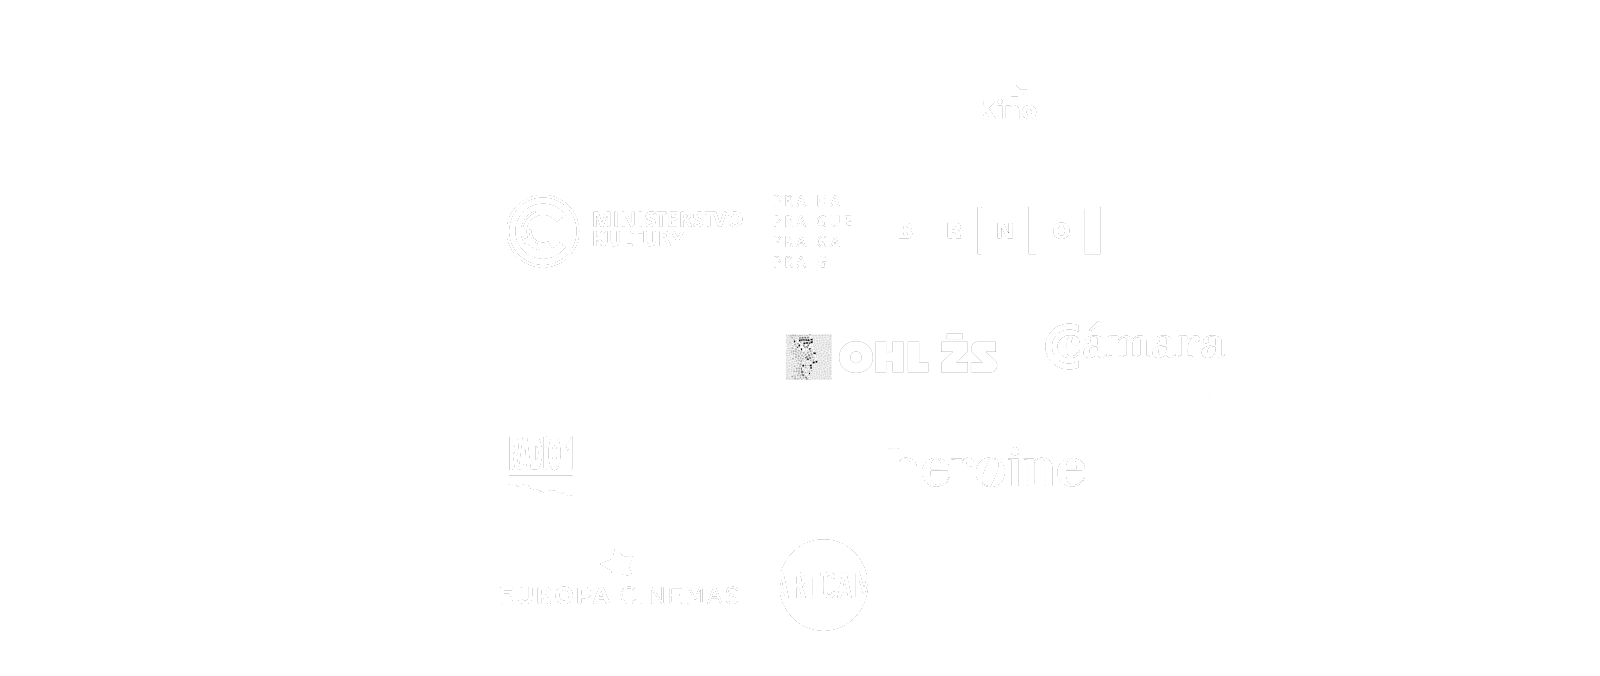 La Pelicula Festival De Cine Espanol